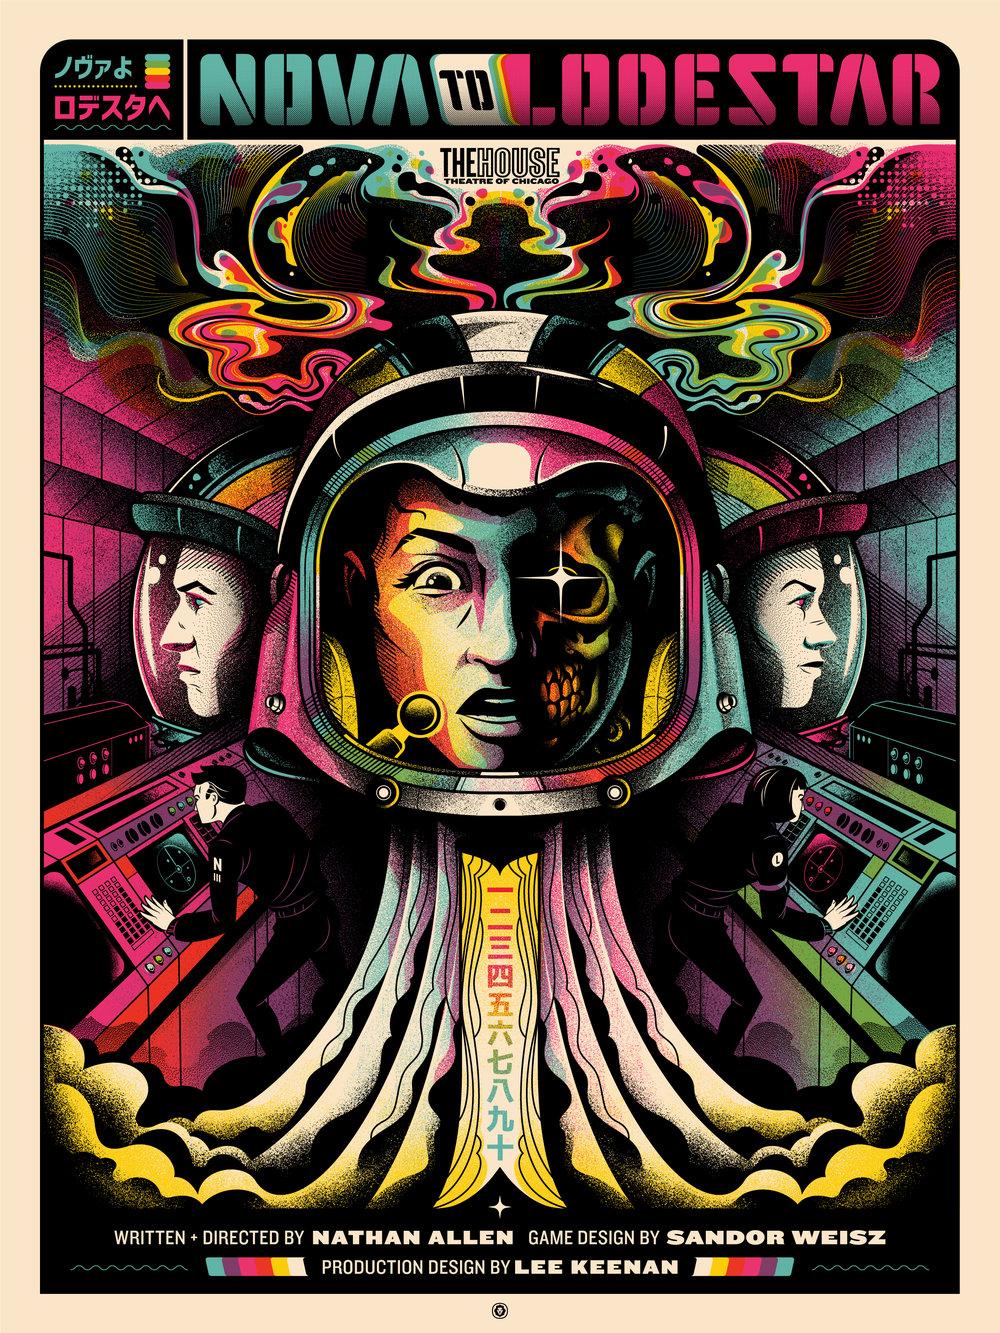 Nova to Lodestar poster live-action game